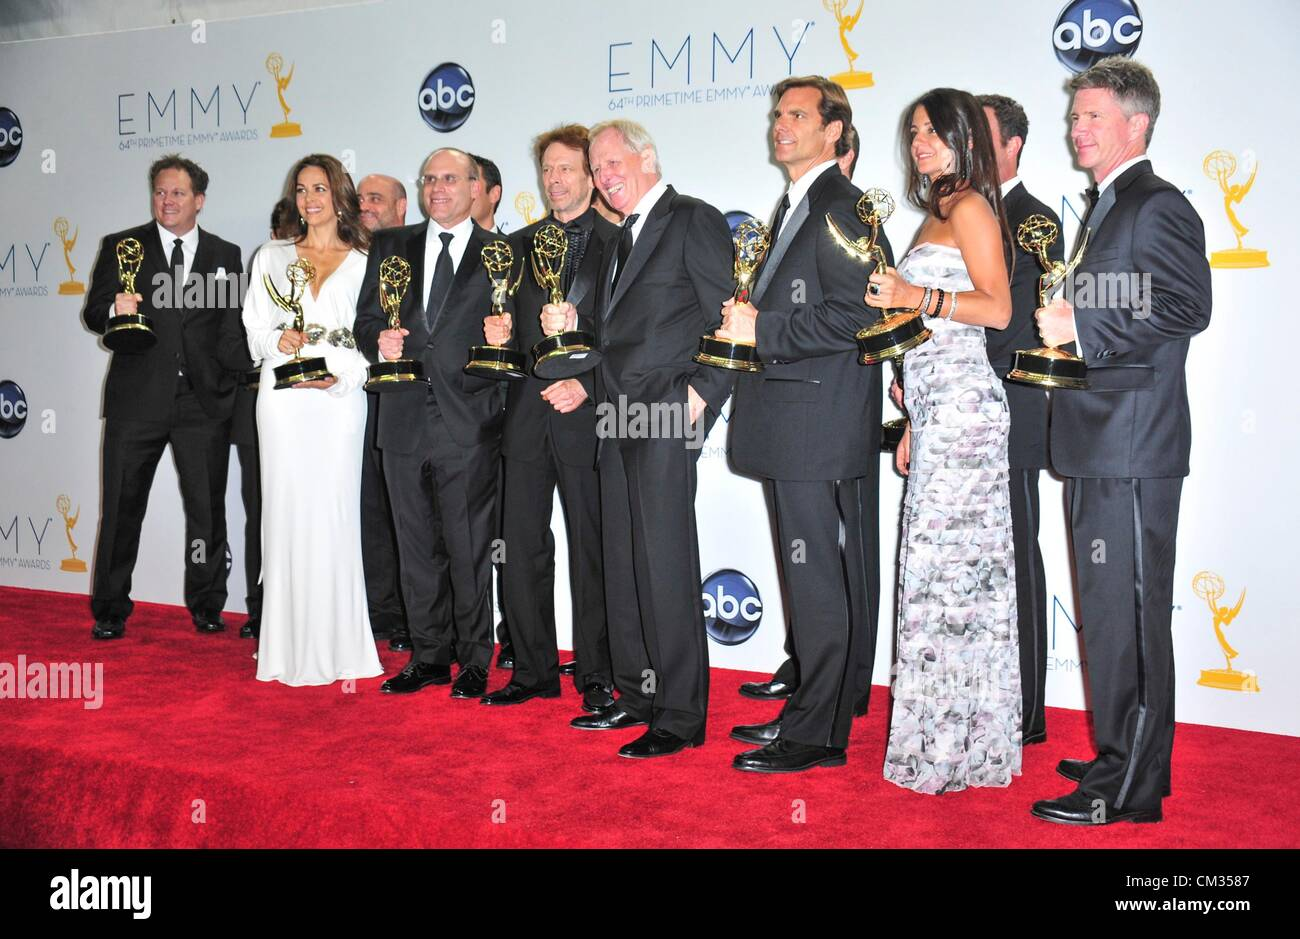 Jerry Bruckheimer Elise Doganieri Bertram van Munster Jonathan Littman inpress room64th Primetime Emmy Awards - - Stock Image